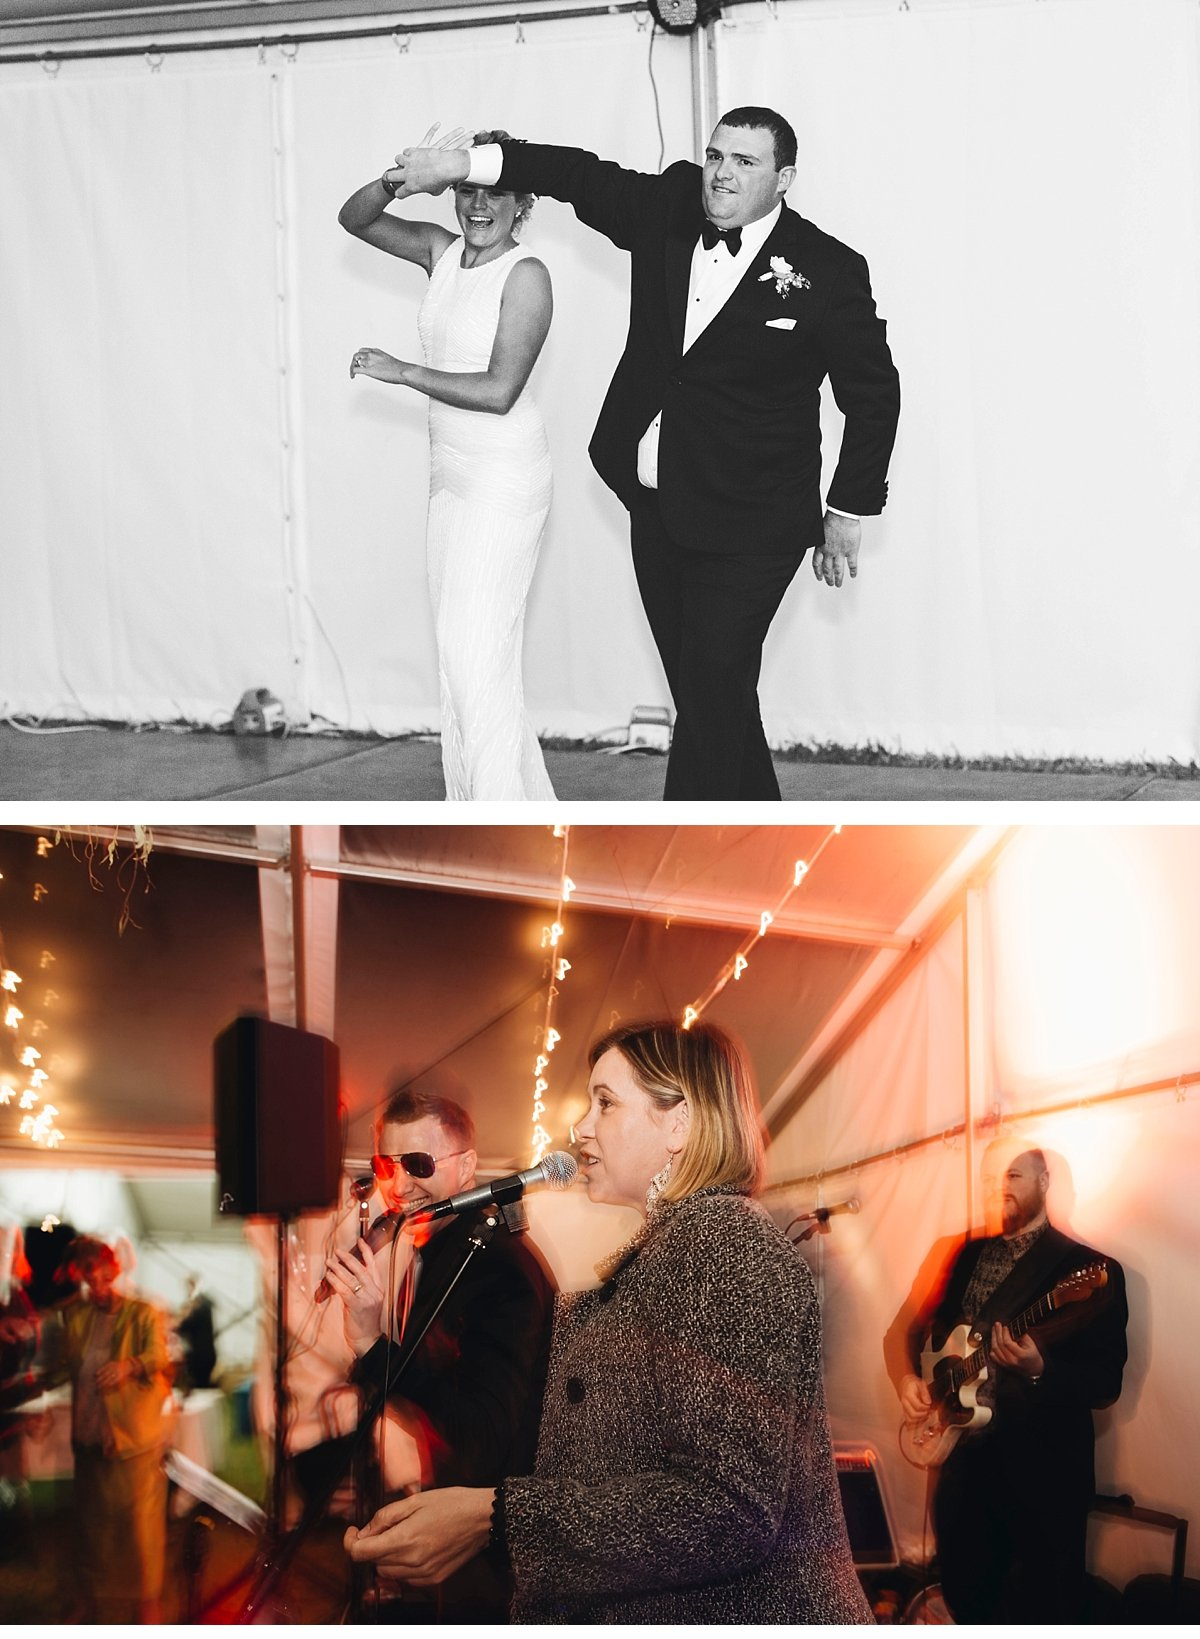 Gundagai Wedding Photographer NSW photographers Wagga Wagga Albury Rutherglen26